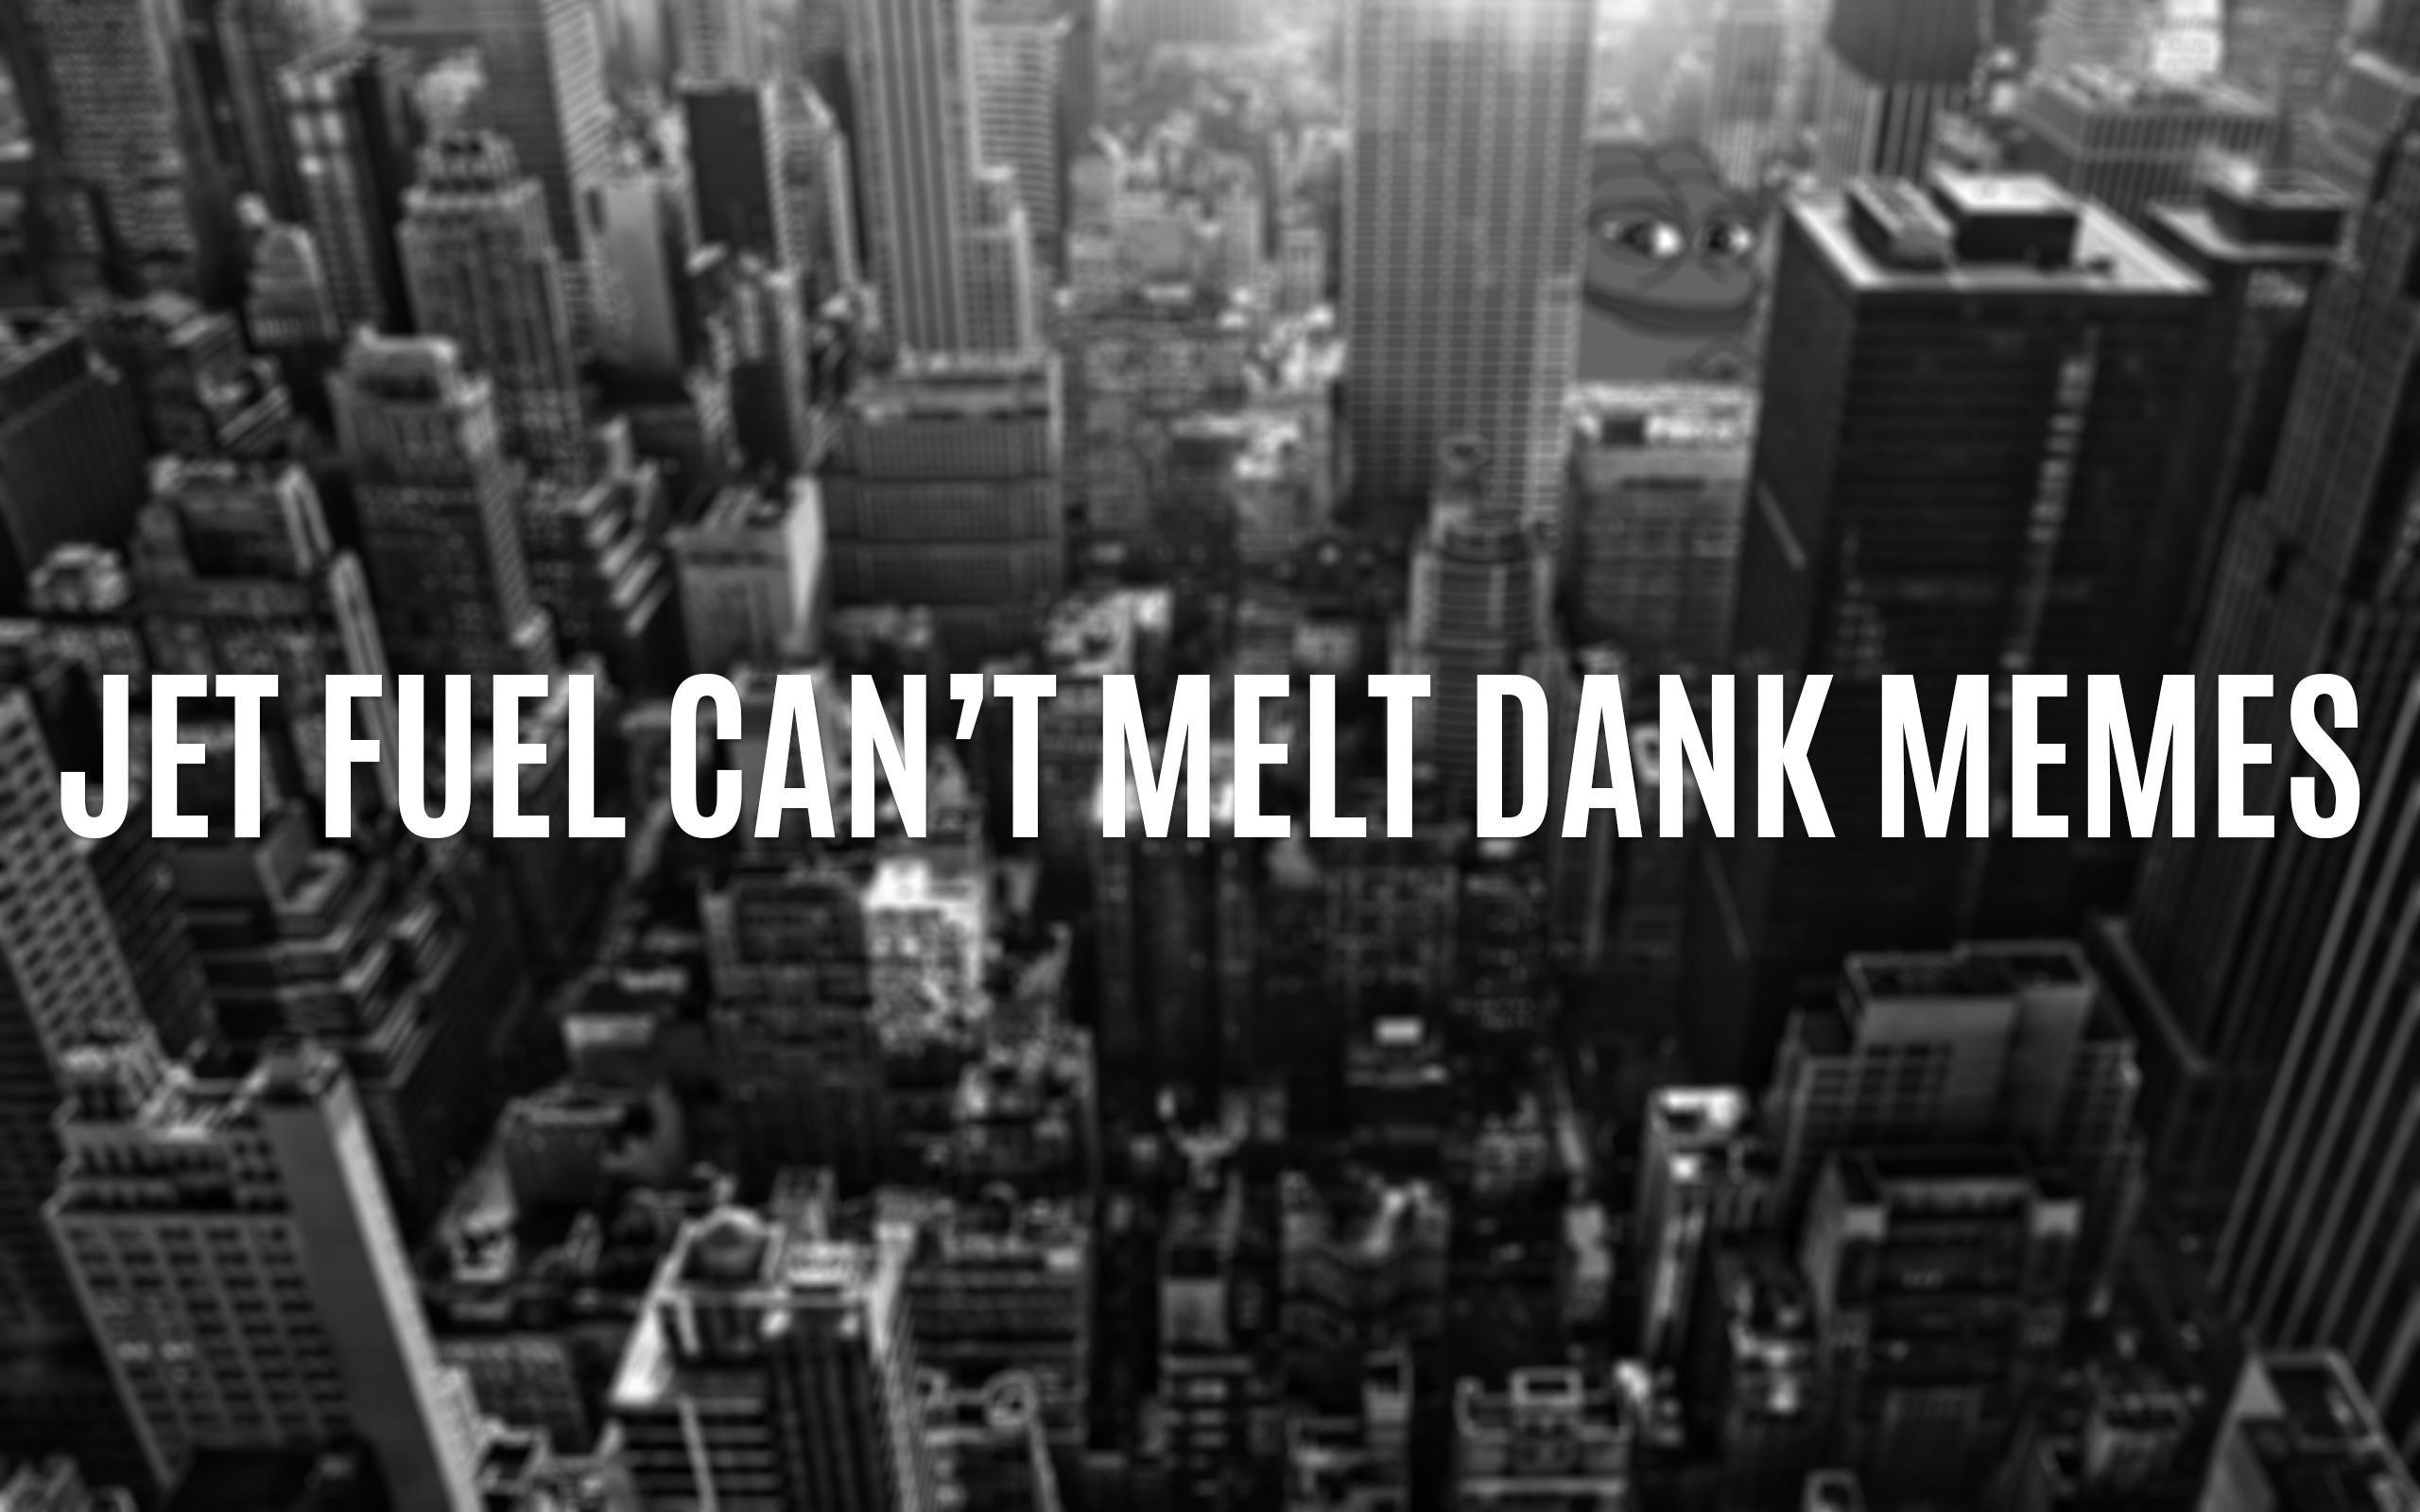 JET FUEL CAN'T MELT DANK MEMES …